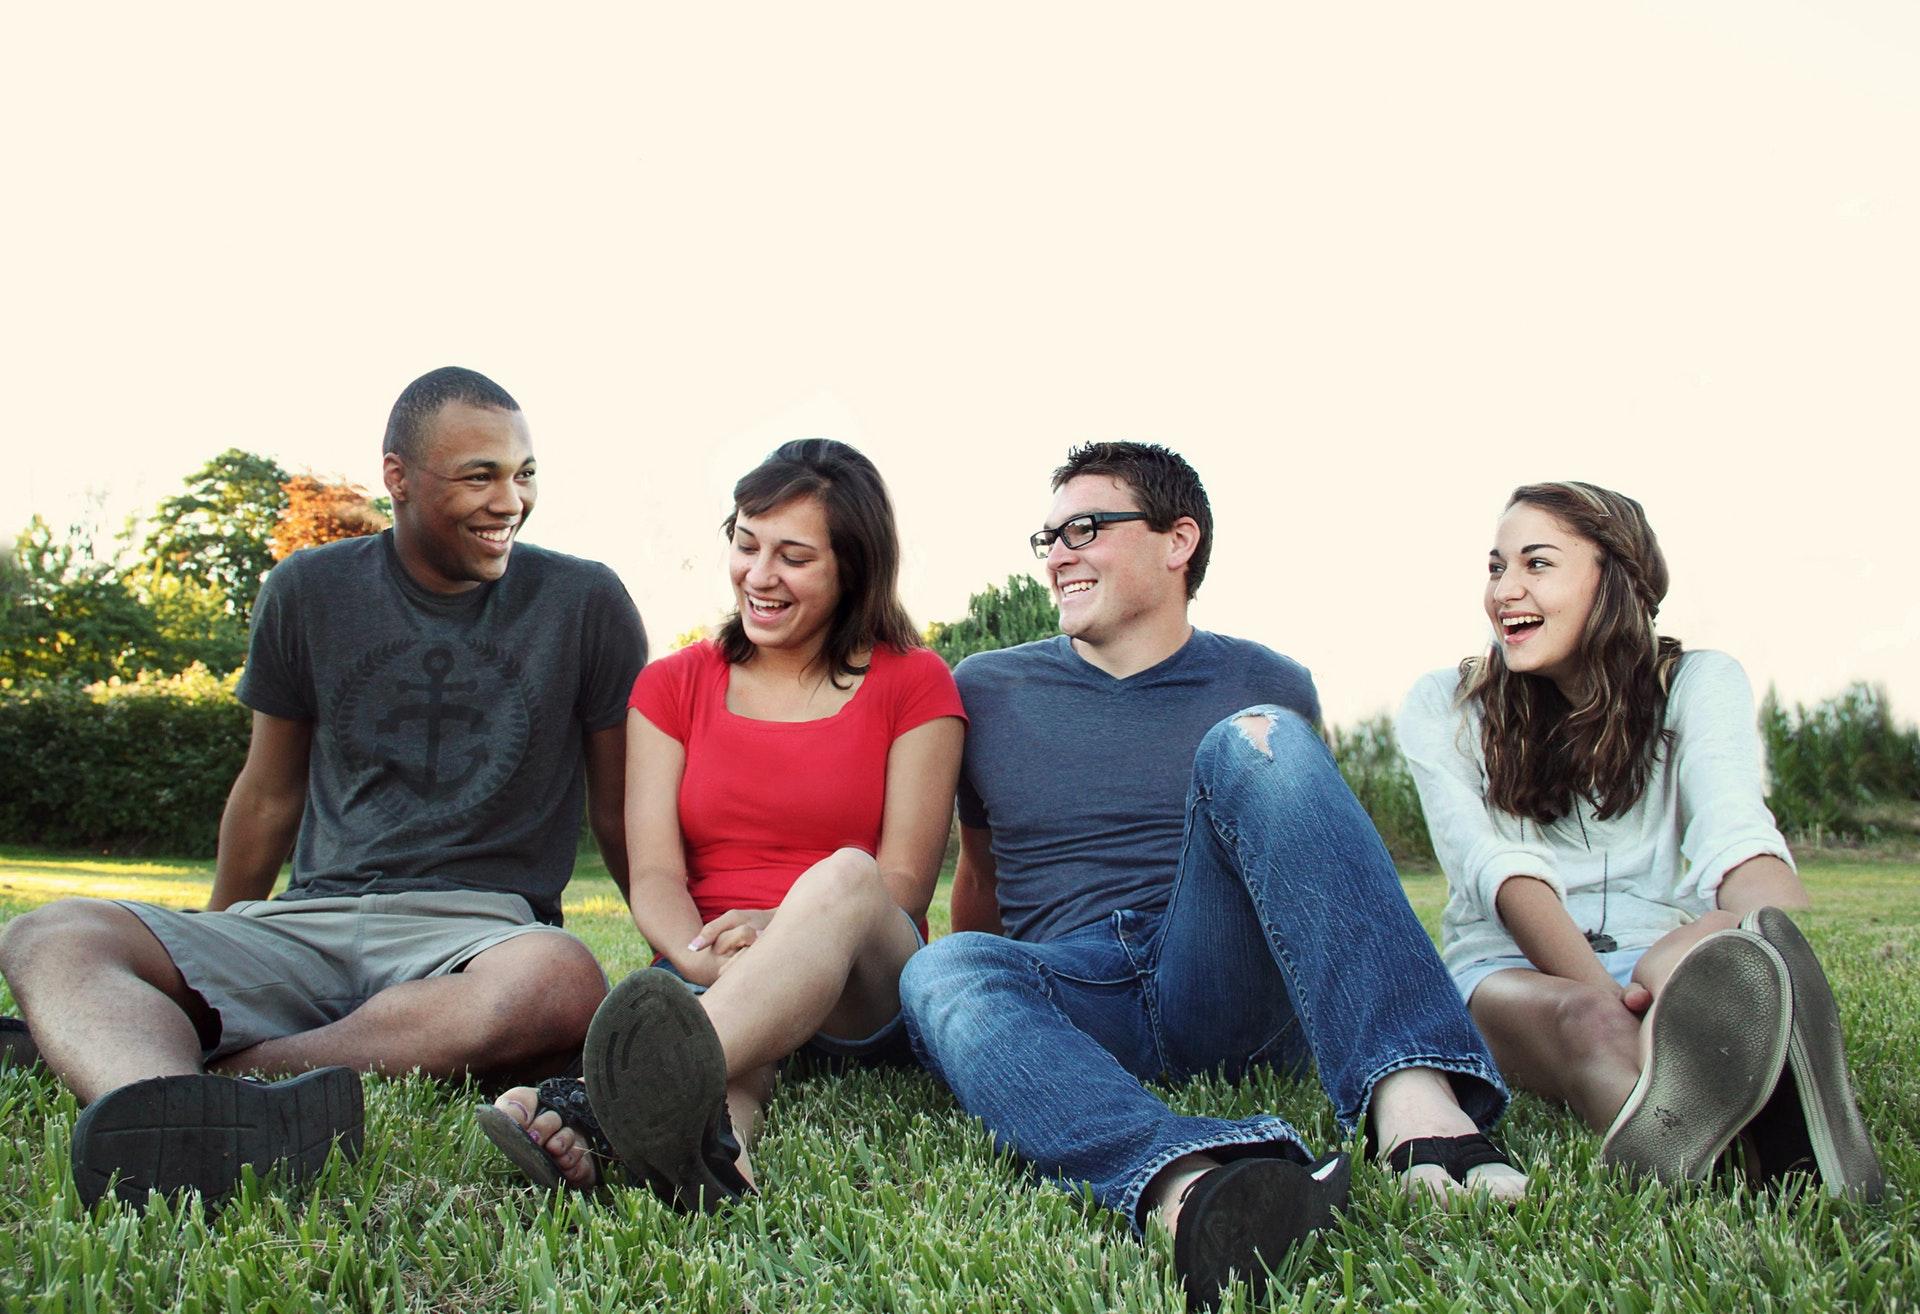 Jessica Fern Monogamy to Polyamory Lexi Sylver SDC Podcast